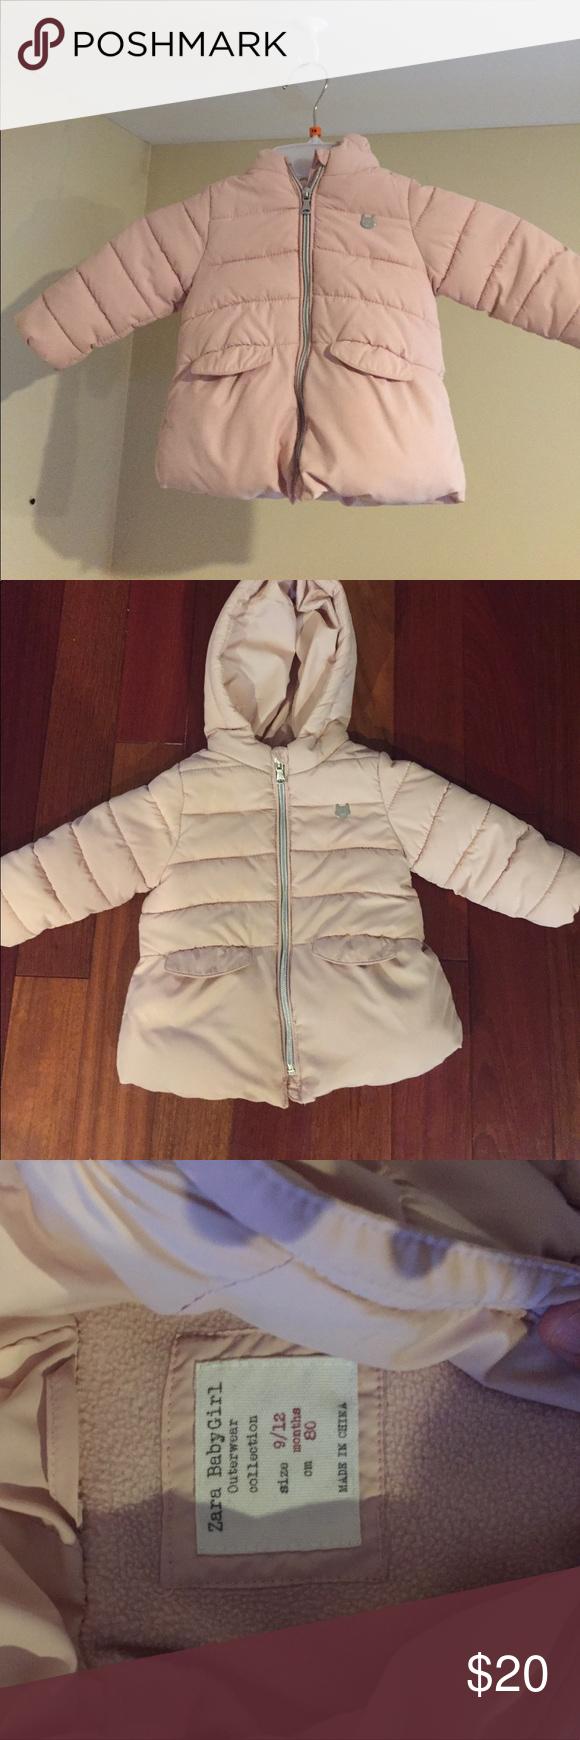 21bcaddb2 Baby Boy Winter Coat 9 12 Months